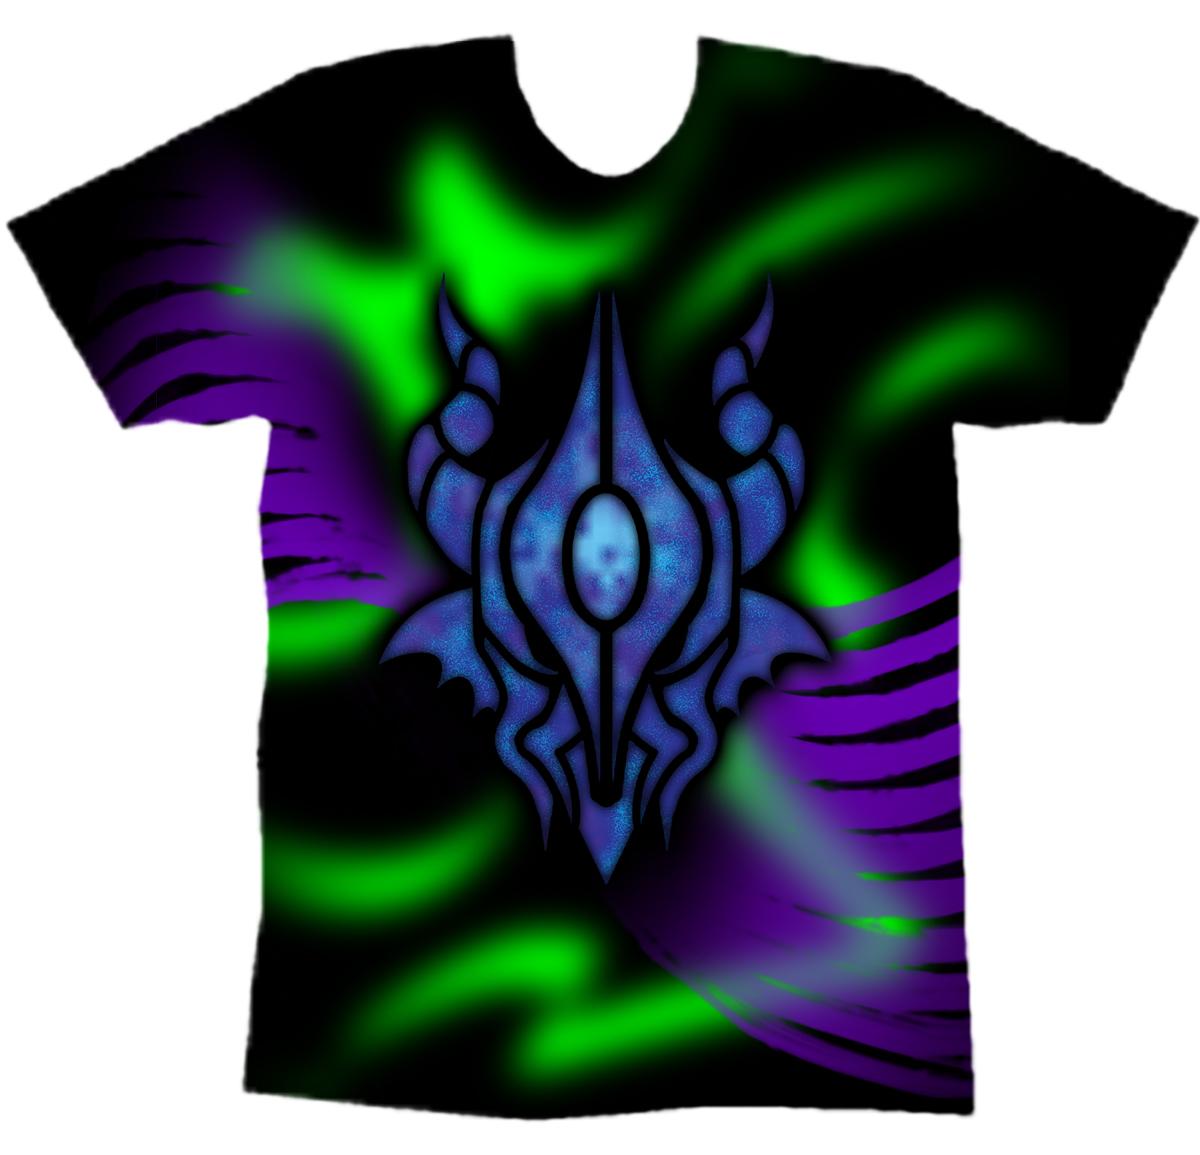 Design t shirts logo -  Dragon Logo T Shirt Design By Chameleon Veil